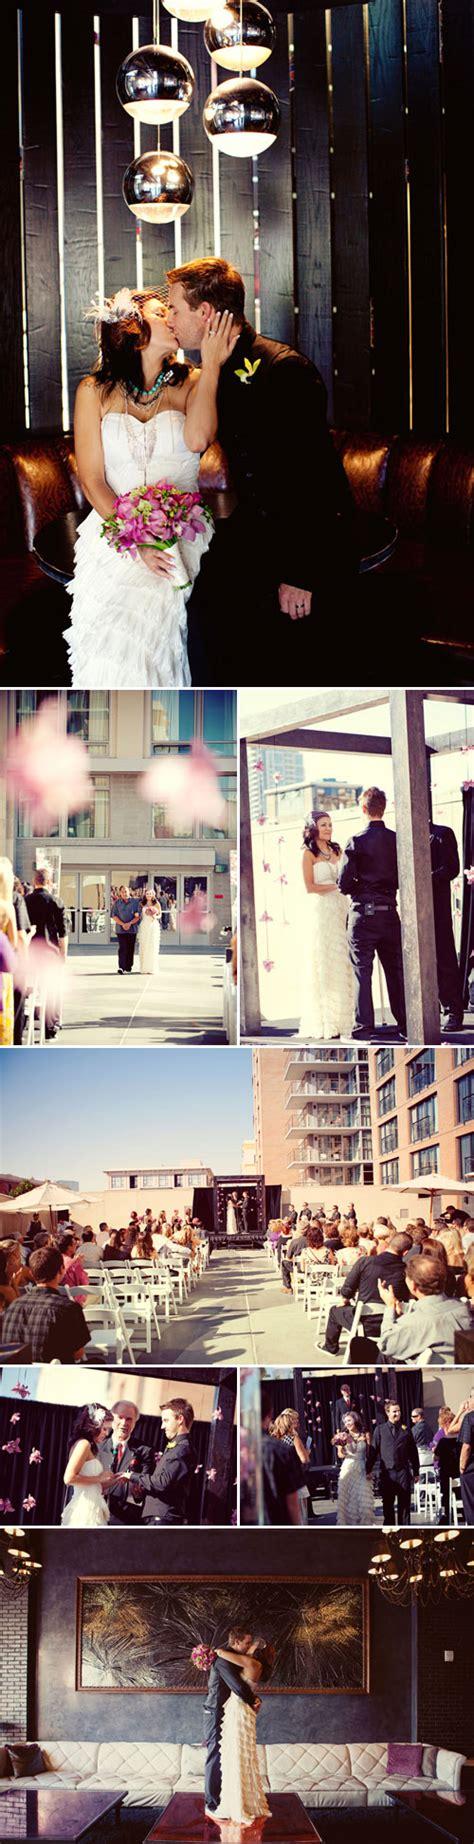 Set Rosha Setelan Blouse Rok Linen Motif Flower rock styled pink and black wedding at san diego s rock hotel ricci and